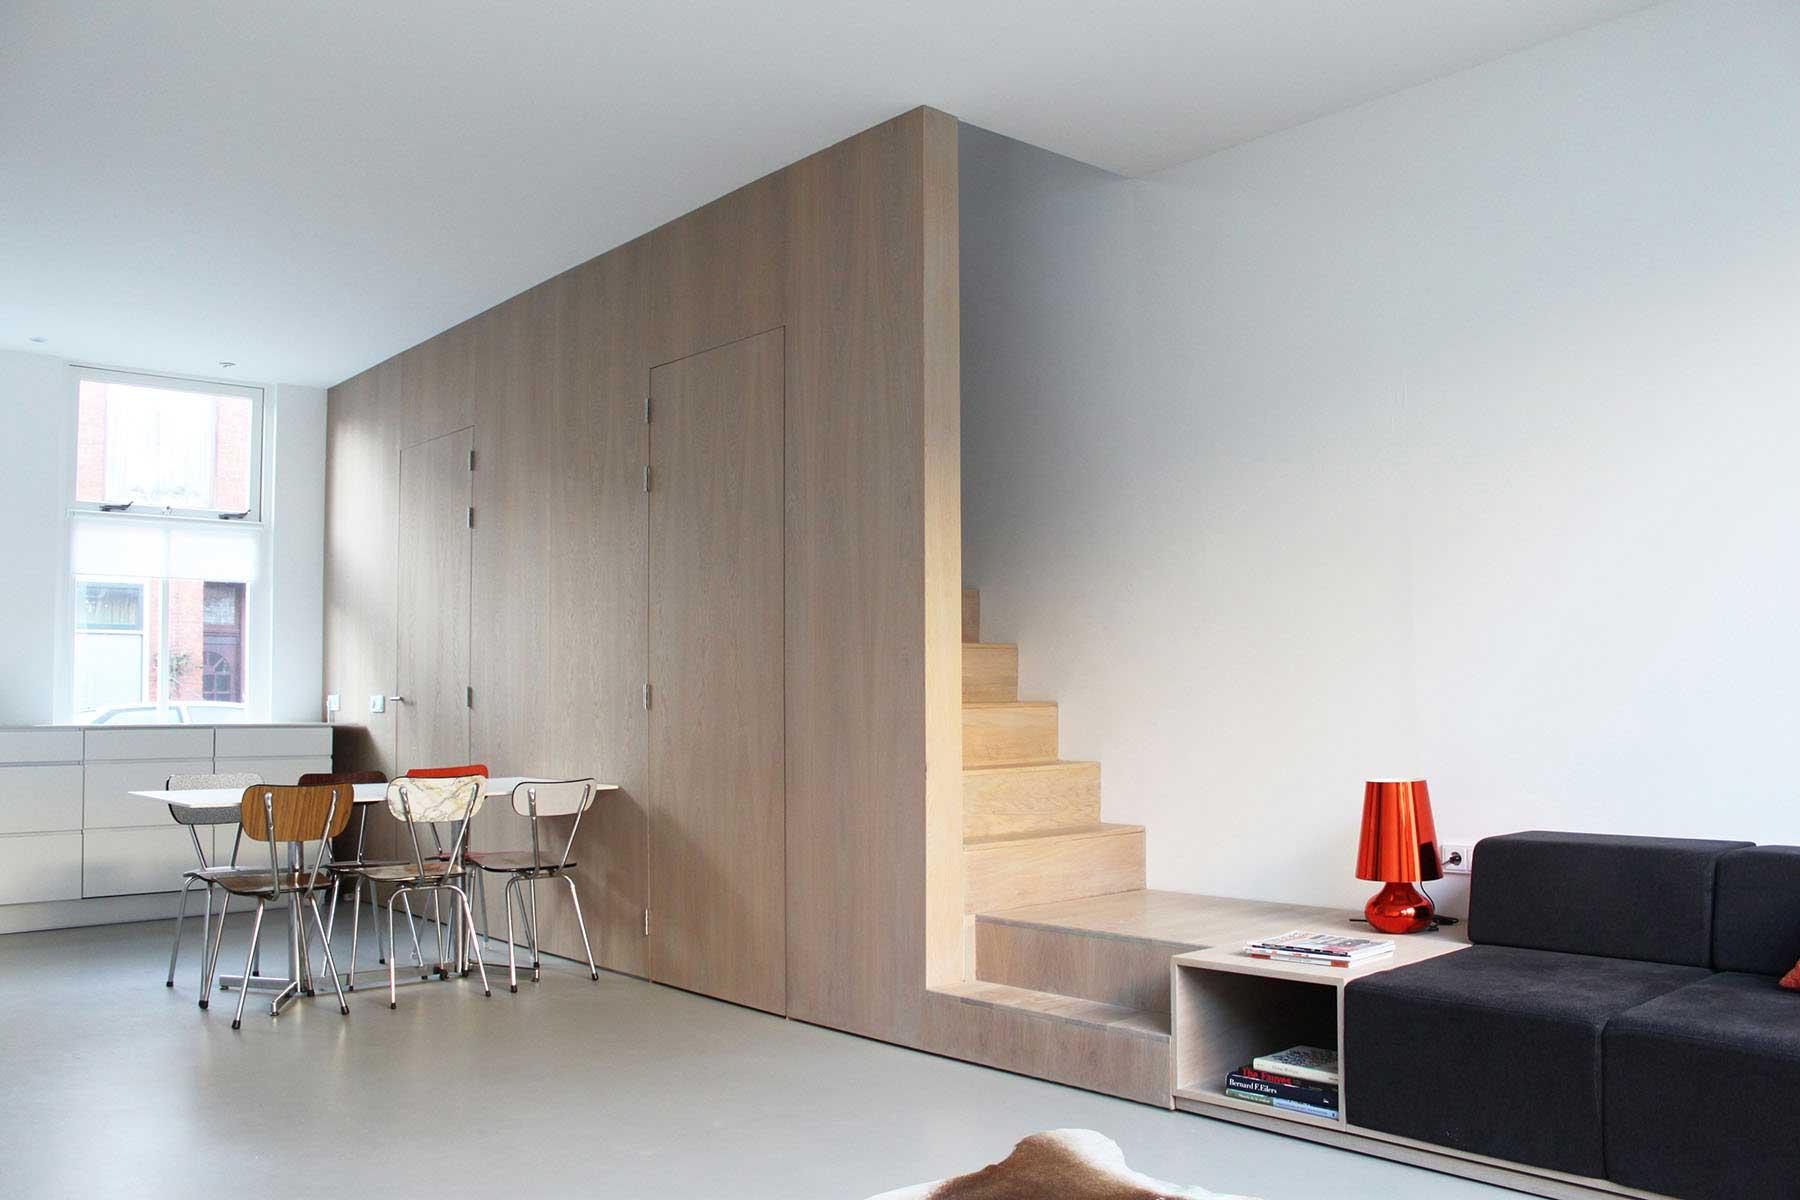 8A Architecten Verbouwing arbeiderswoning tot Pied a Terre, Leiden